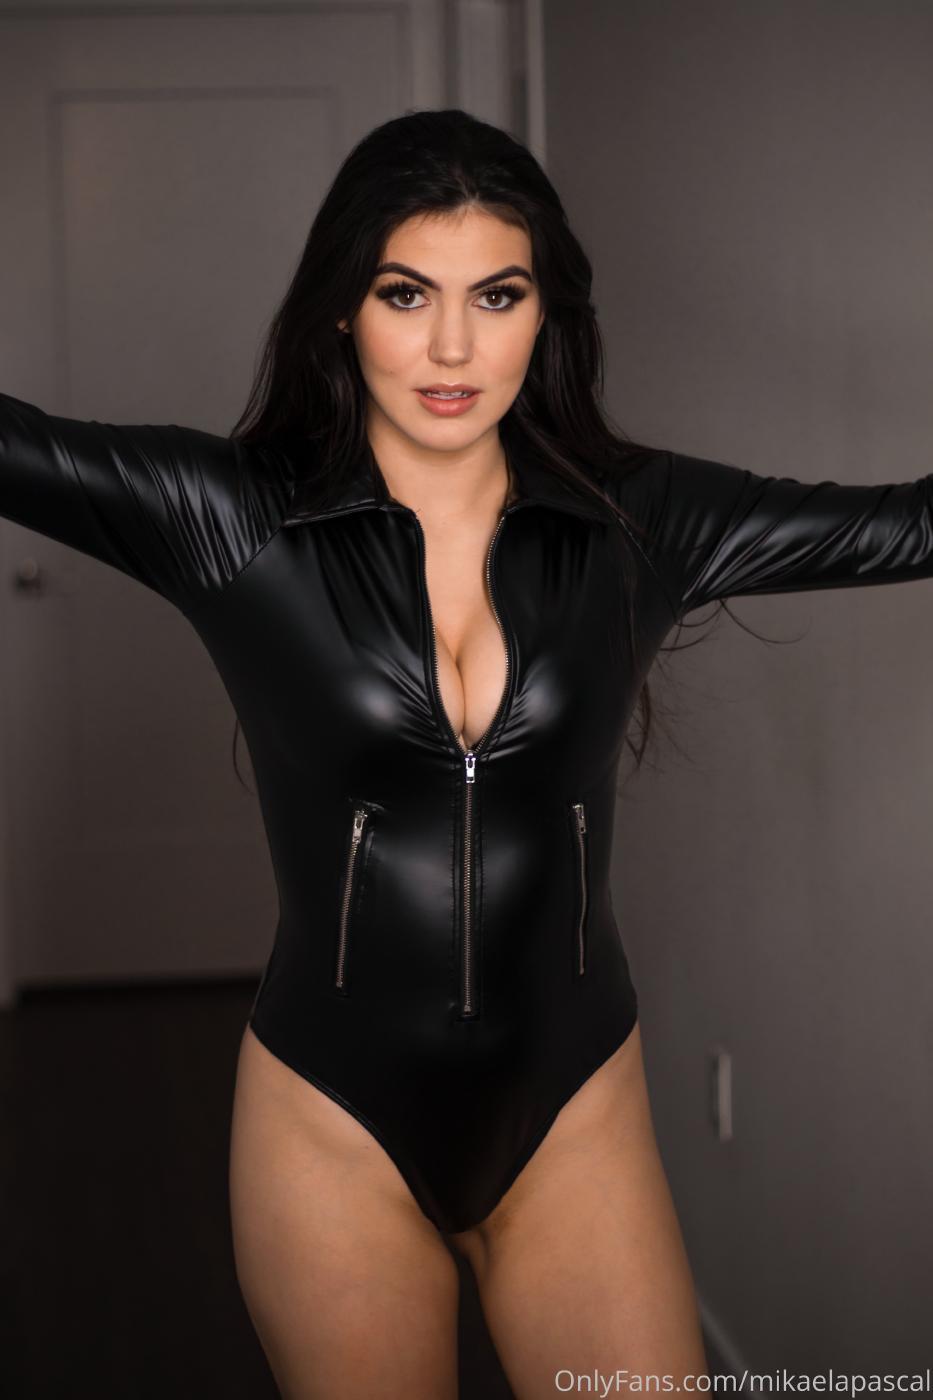 Mikaela Pascal Sexy Leather Bodysuit Onlyfans Set Leaked 0009